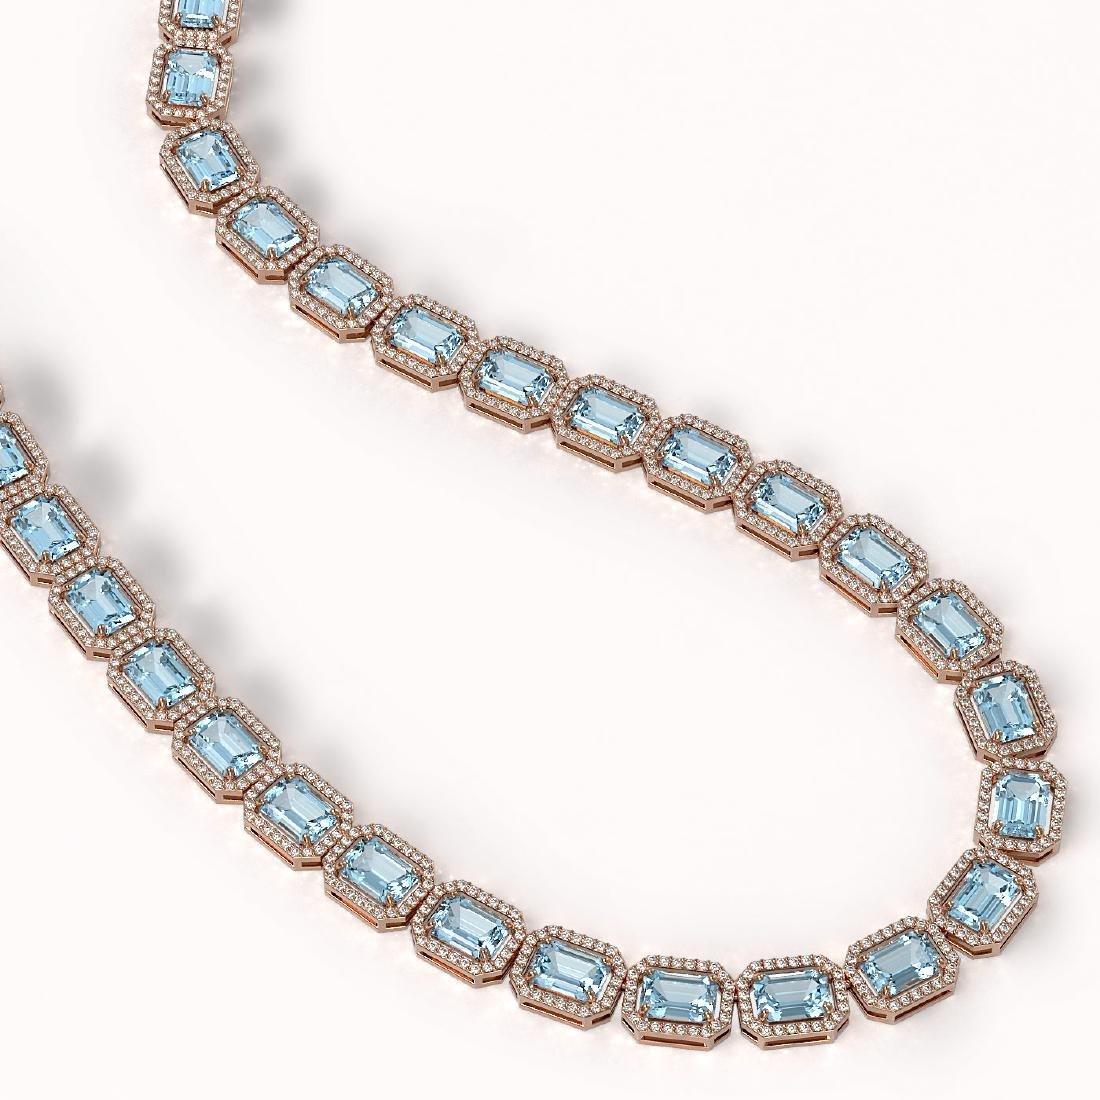 52.89 CTW Sky Topaz & Diamond Halo Necklace 10K Rose - 2